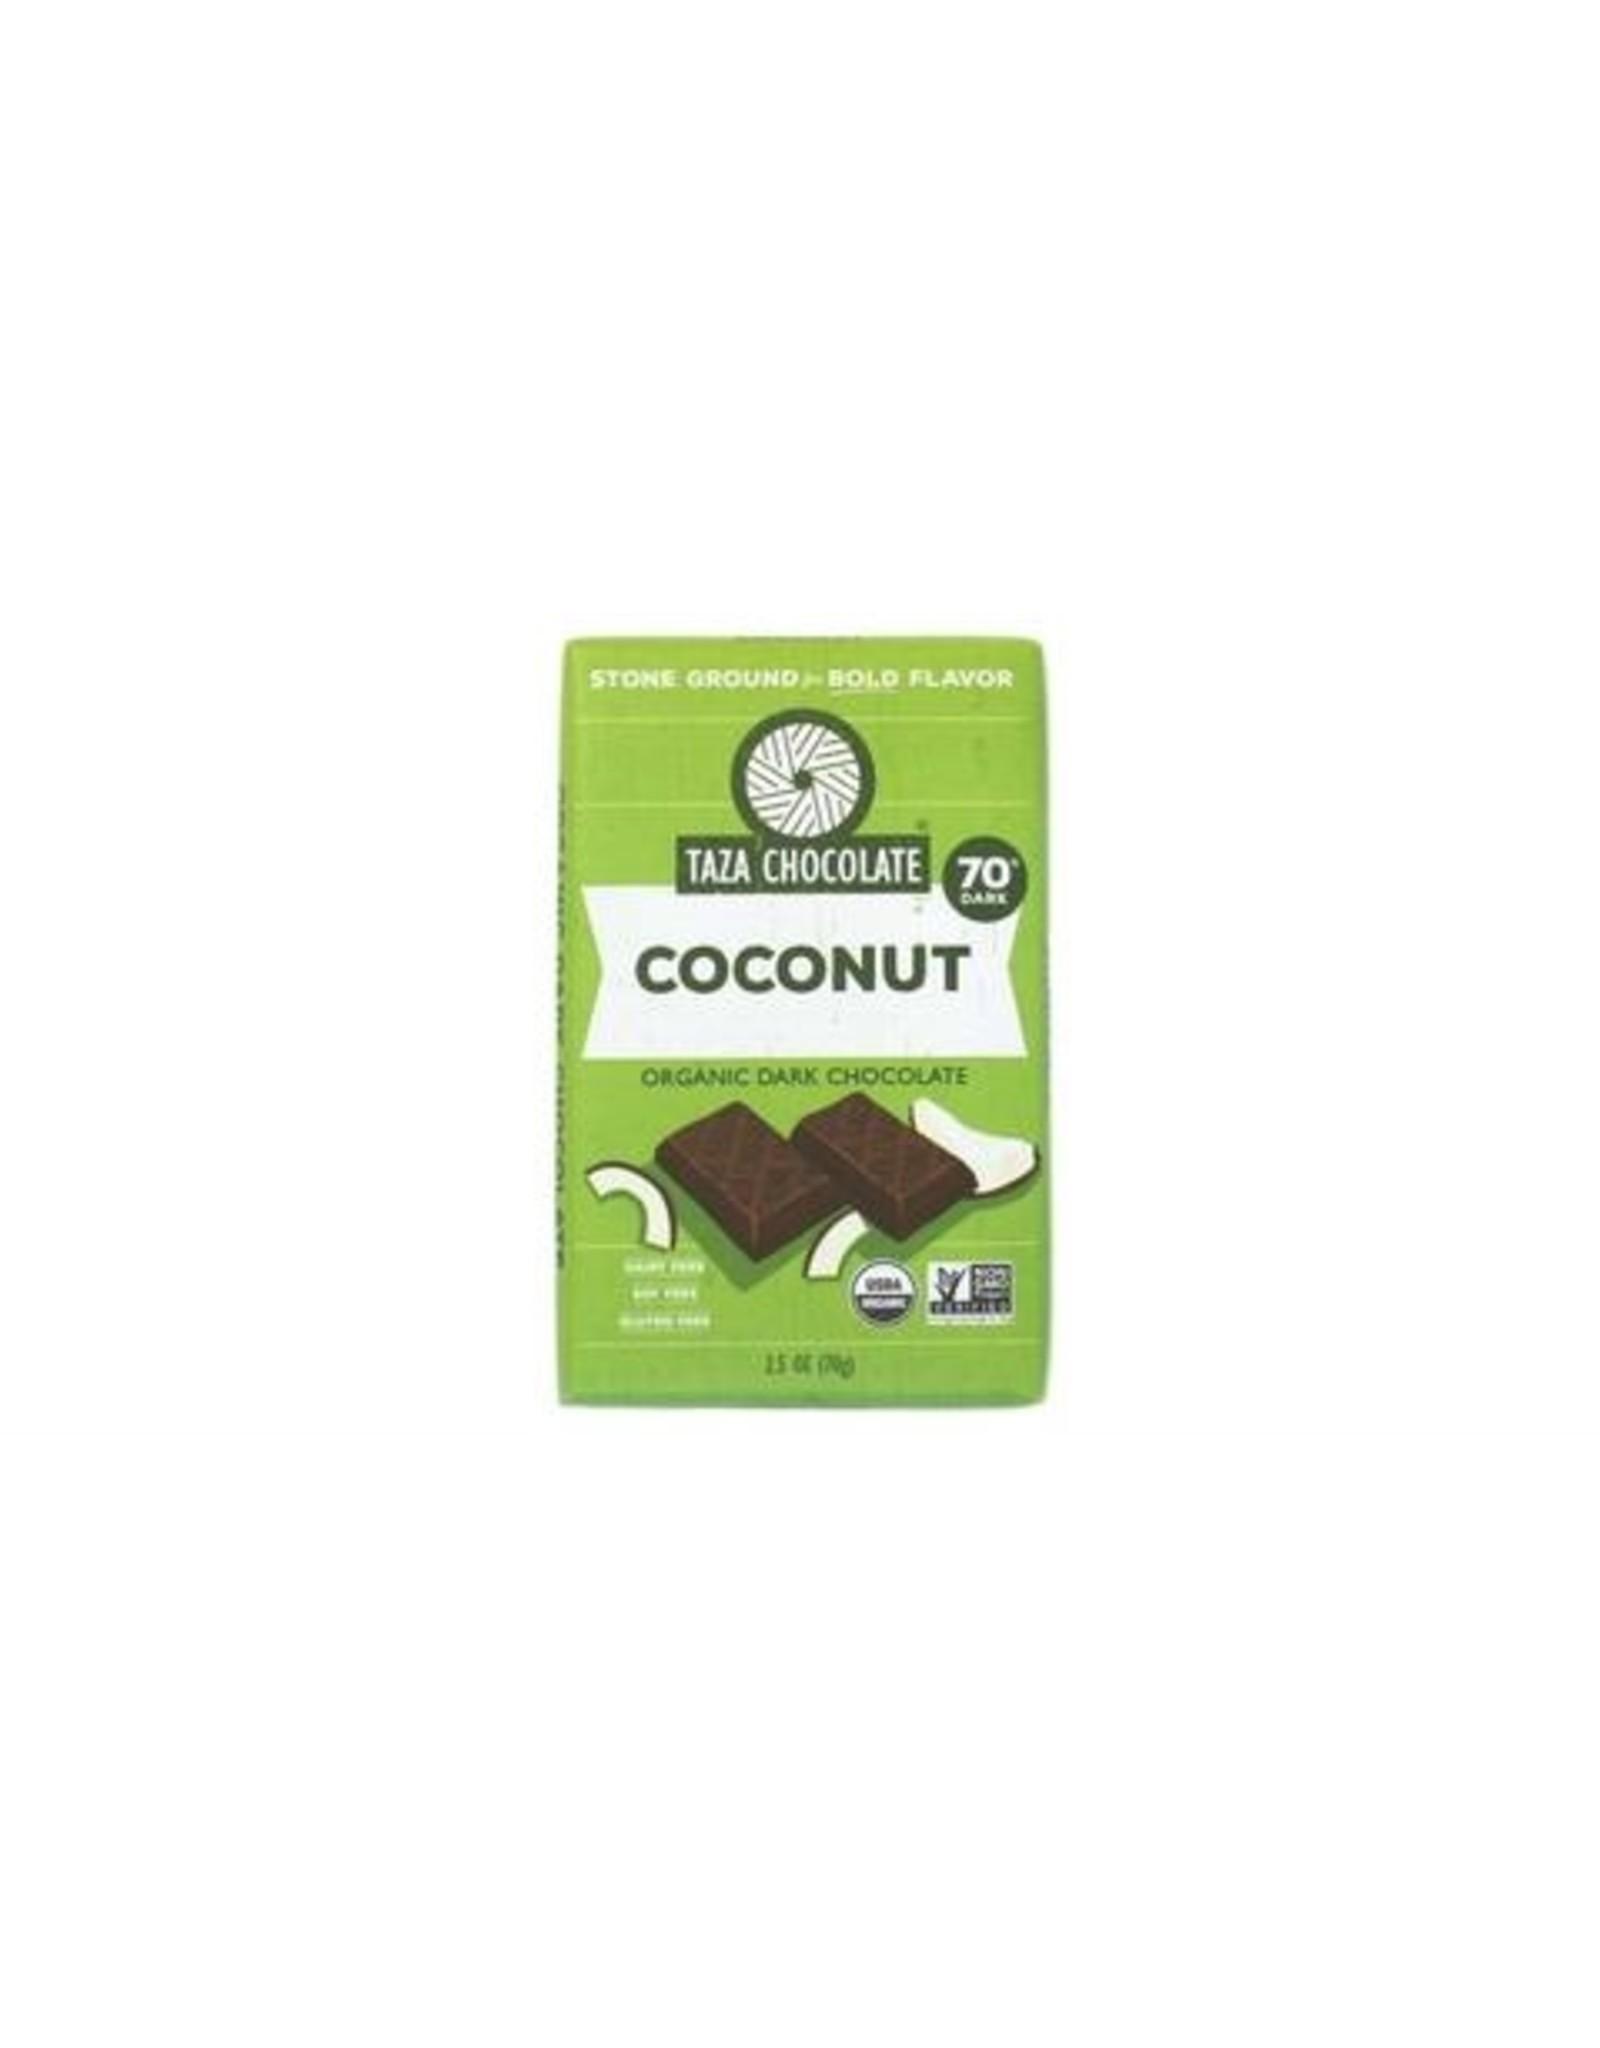 Taza Chocolate Taza Organic Wicked Dark Chocolate Bar with Coconut